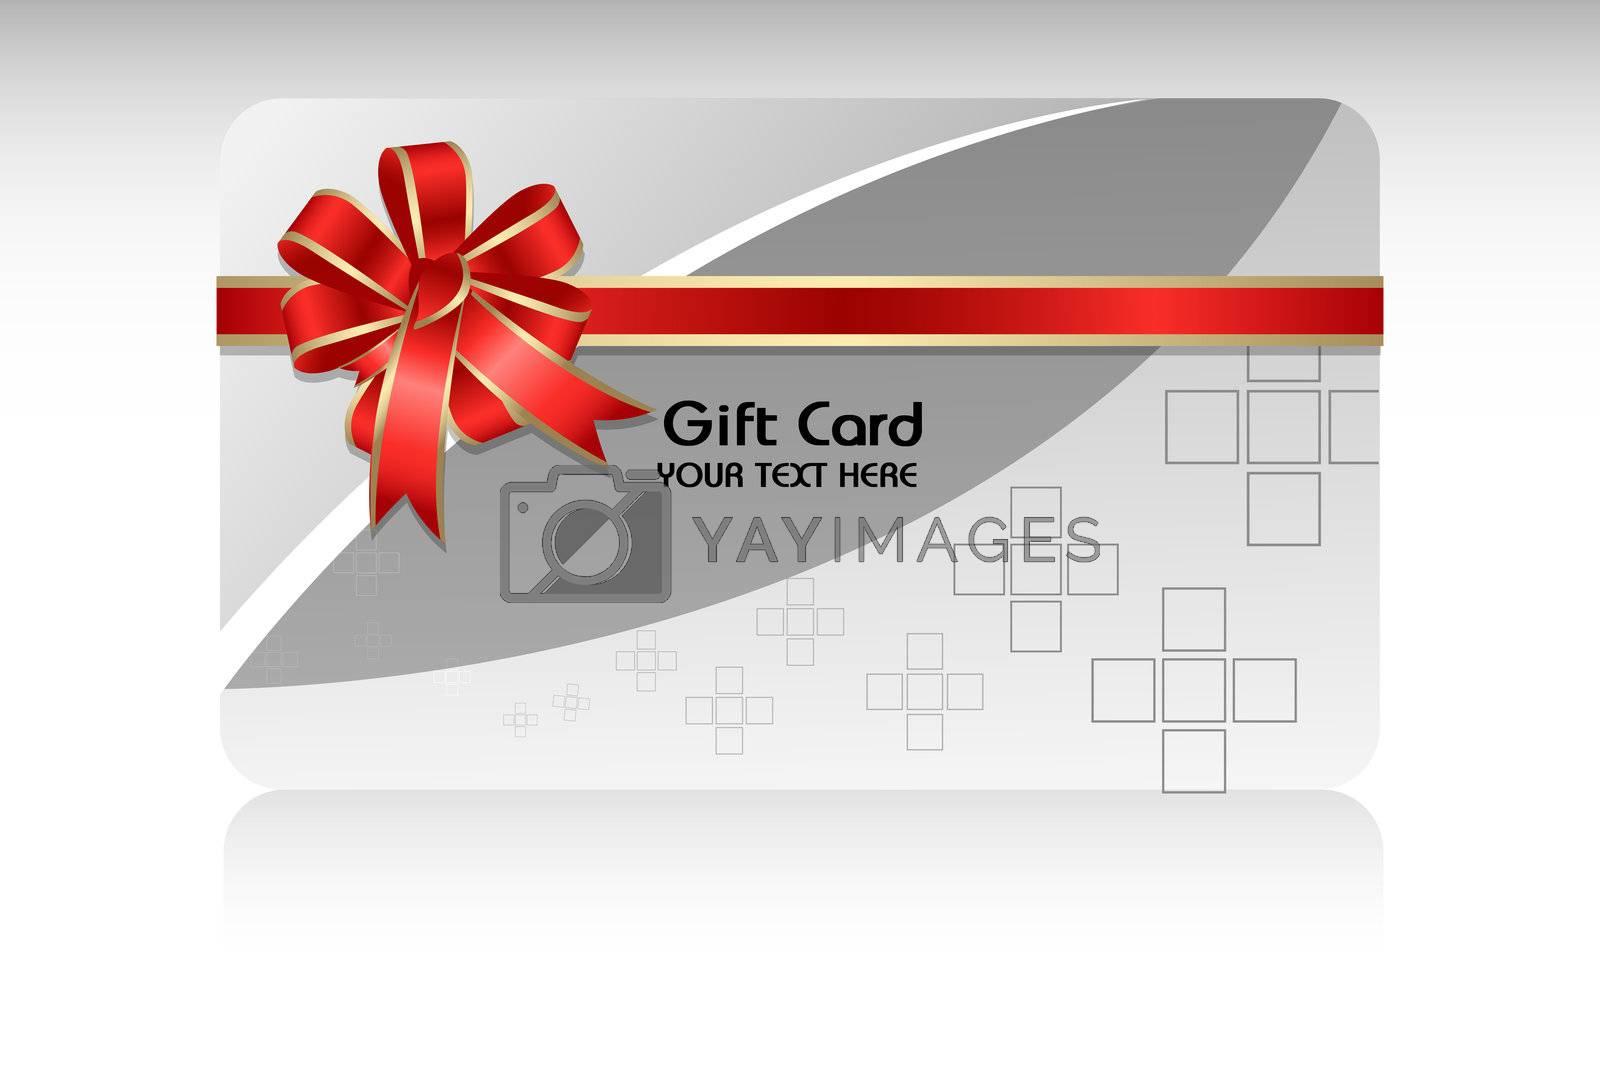 illustration of gift card on white background